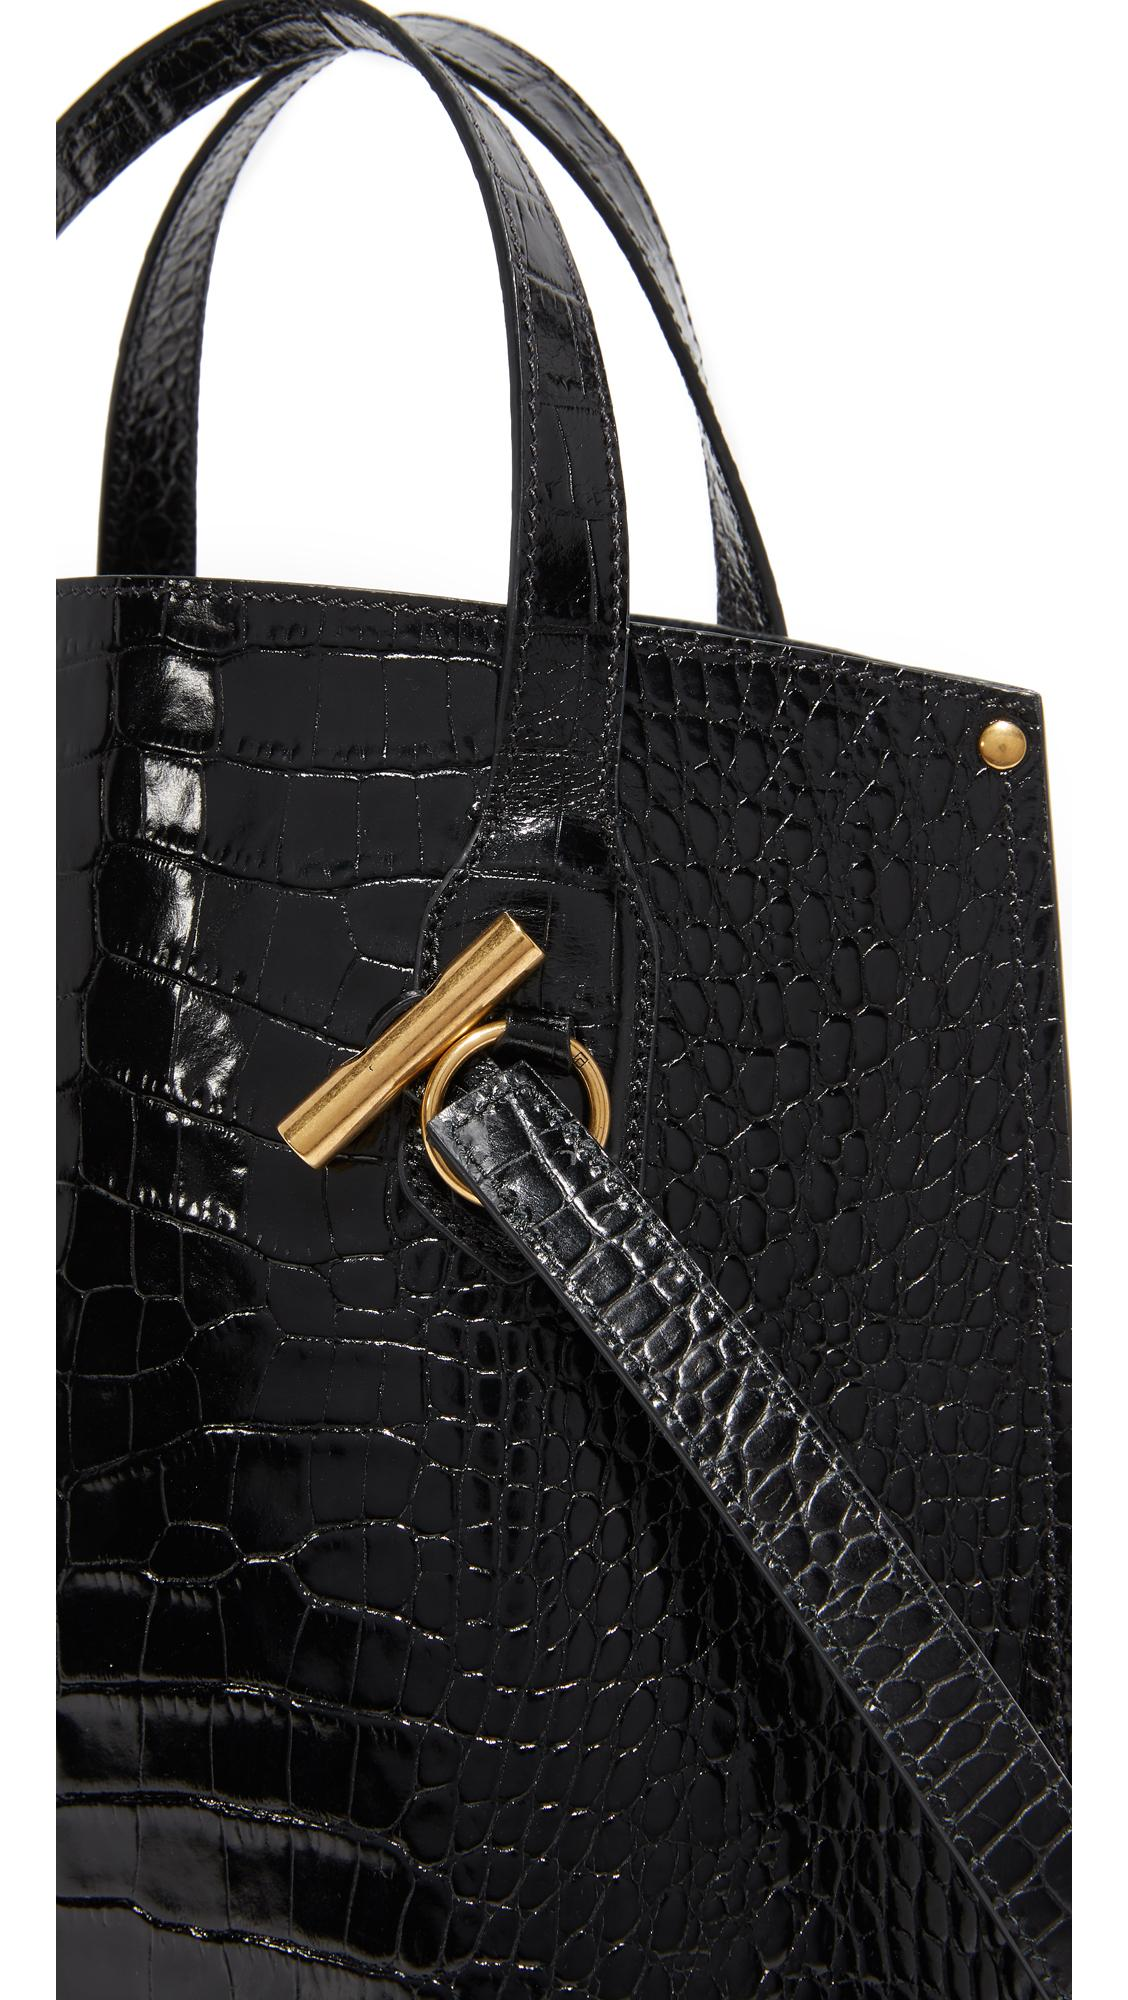 Trademark Leather Micro Aubock Mini Tote in Black